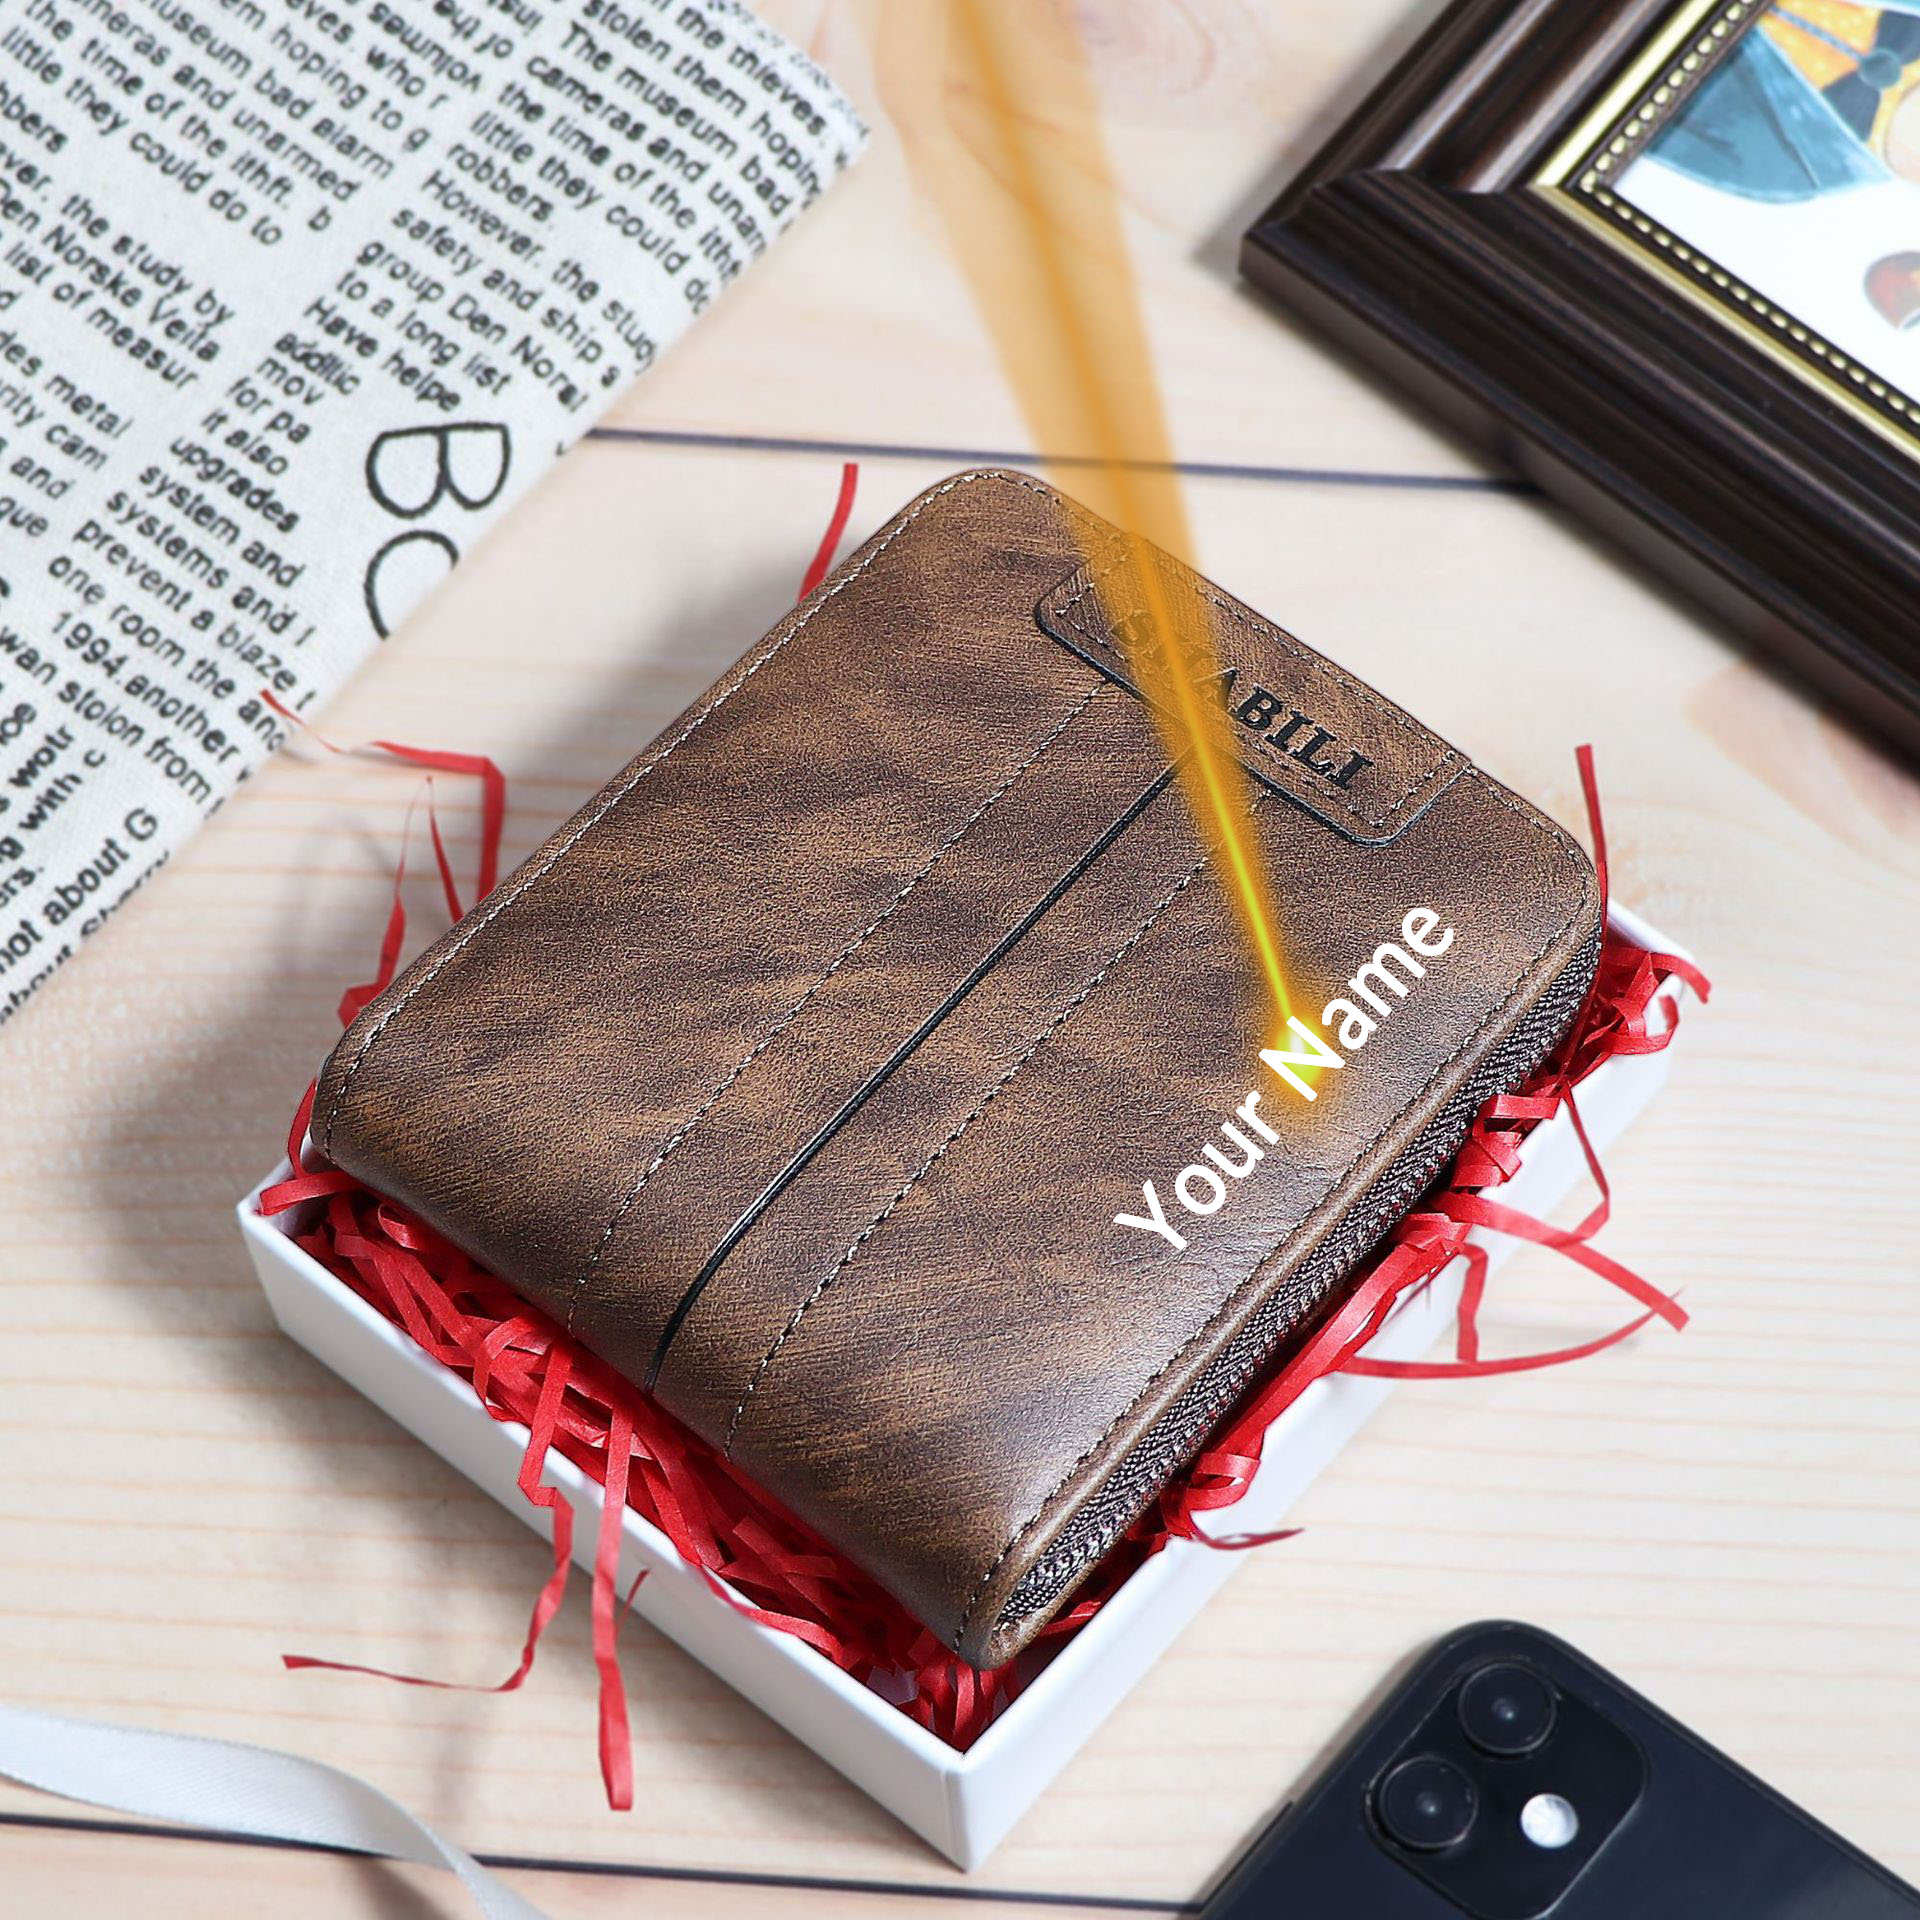 CEXIKA PU Leather Men Wallet Coin Purse Vintage Small Mini Card Holder PORTFOLIO Male Wallets Pocket